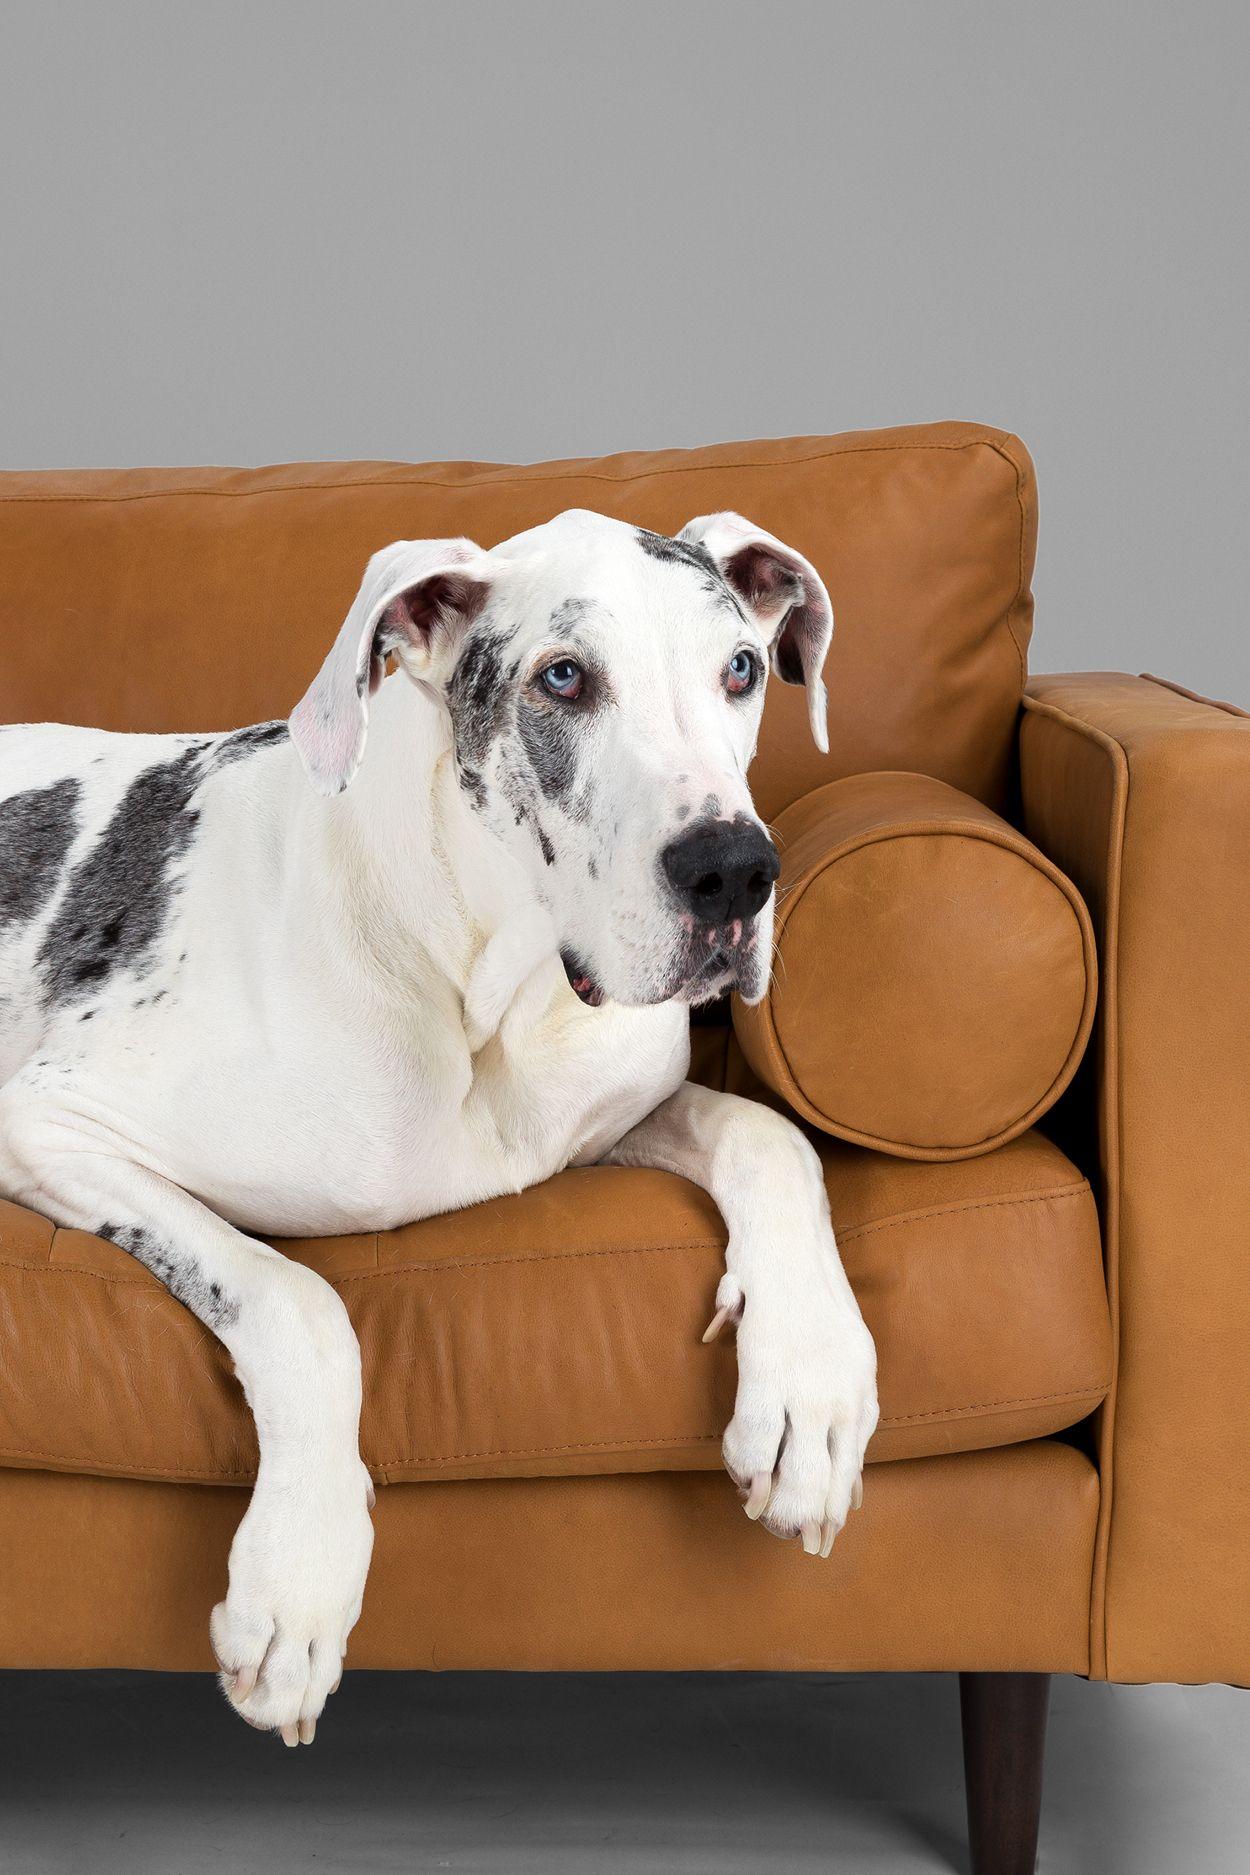 Groovy Sven Charme Tan Sofa Fuzzilcious Puppies Tan Leather Spiritservingveterans Wood Chair Design Ideas Spiritservingveteransorg